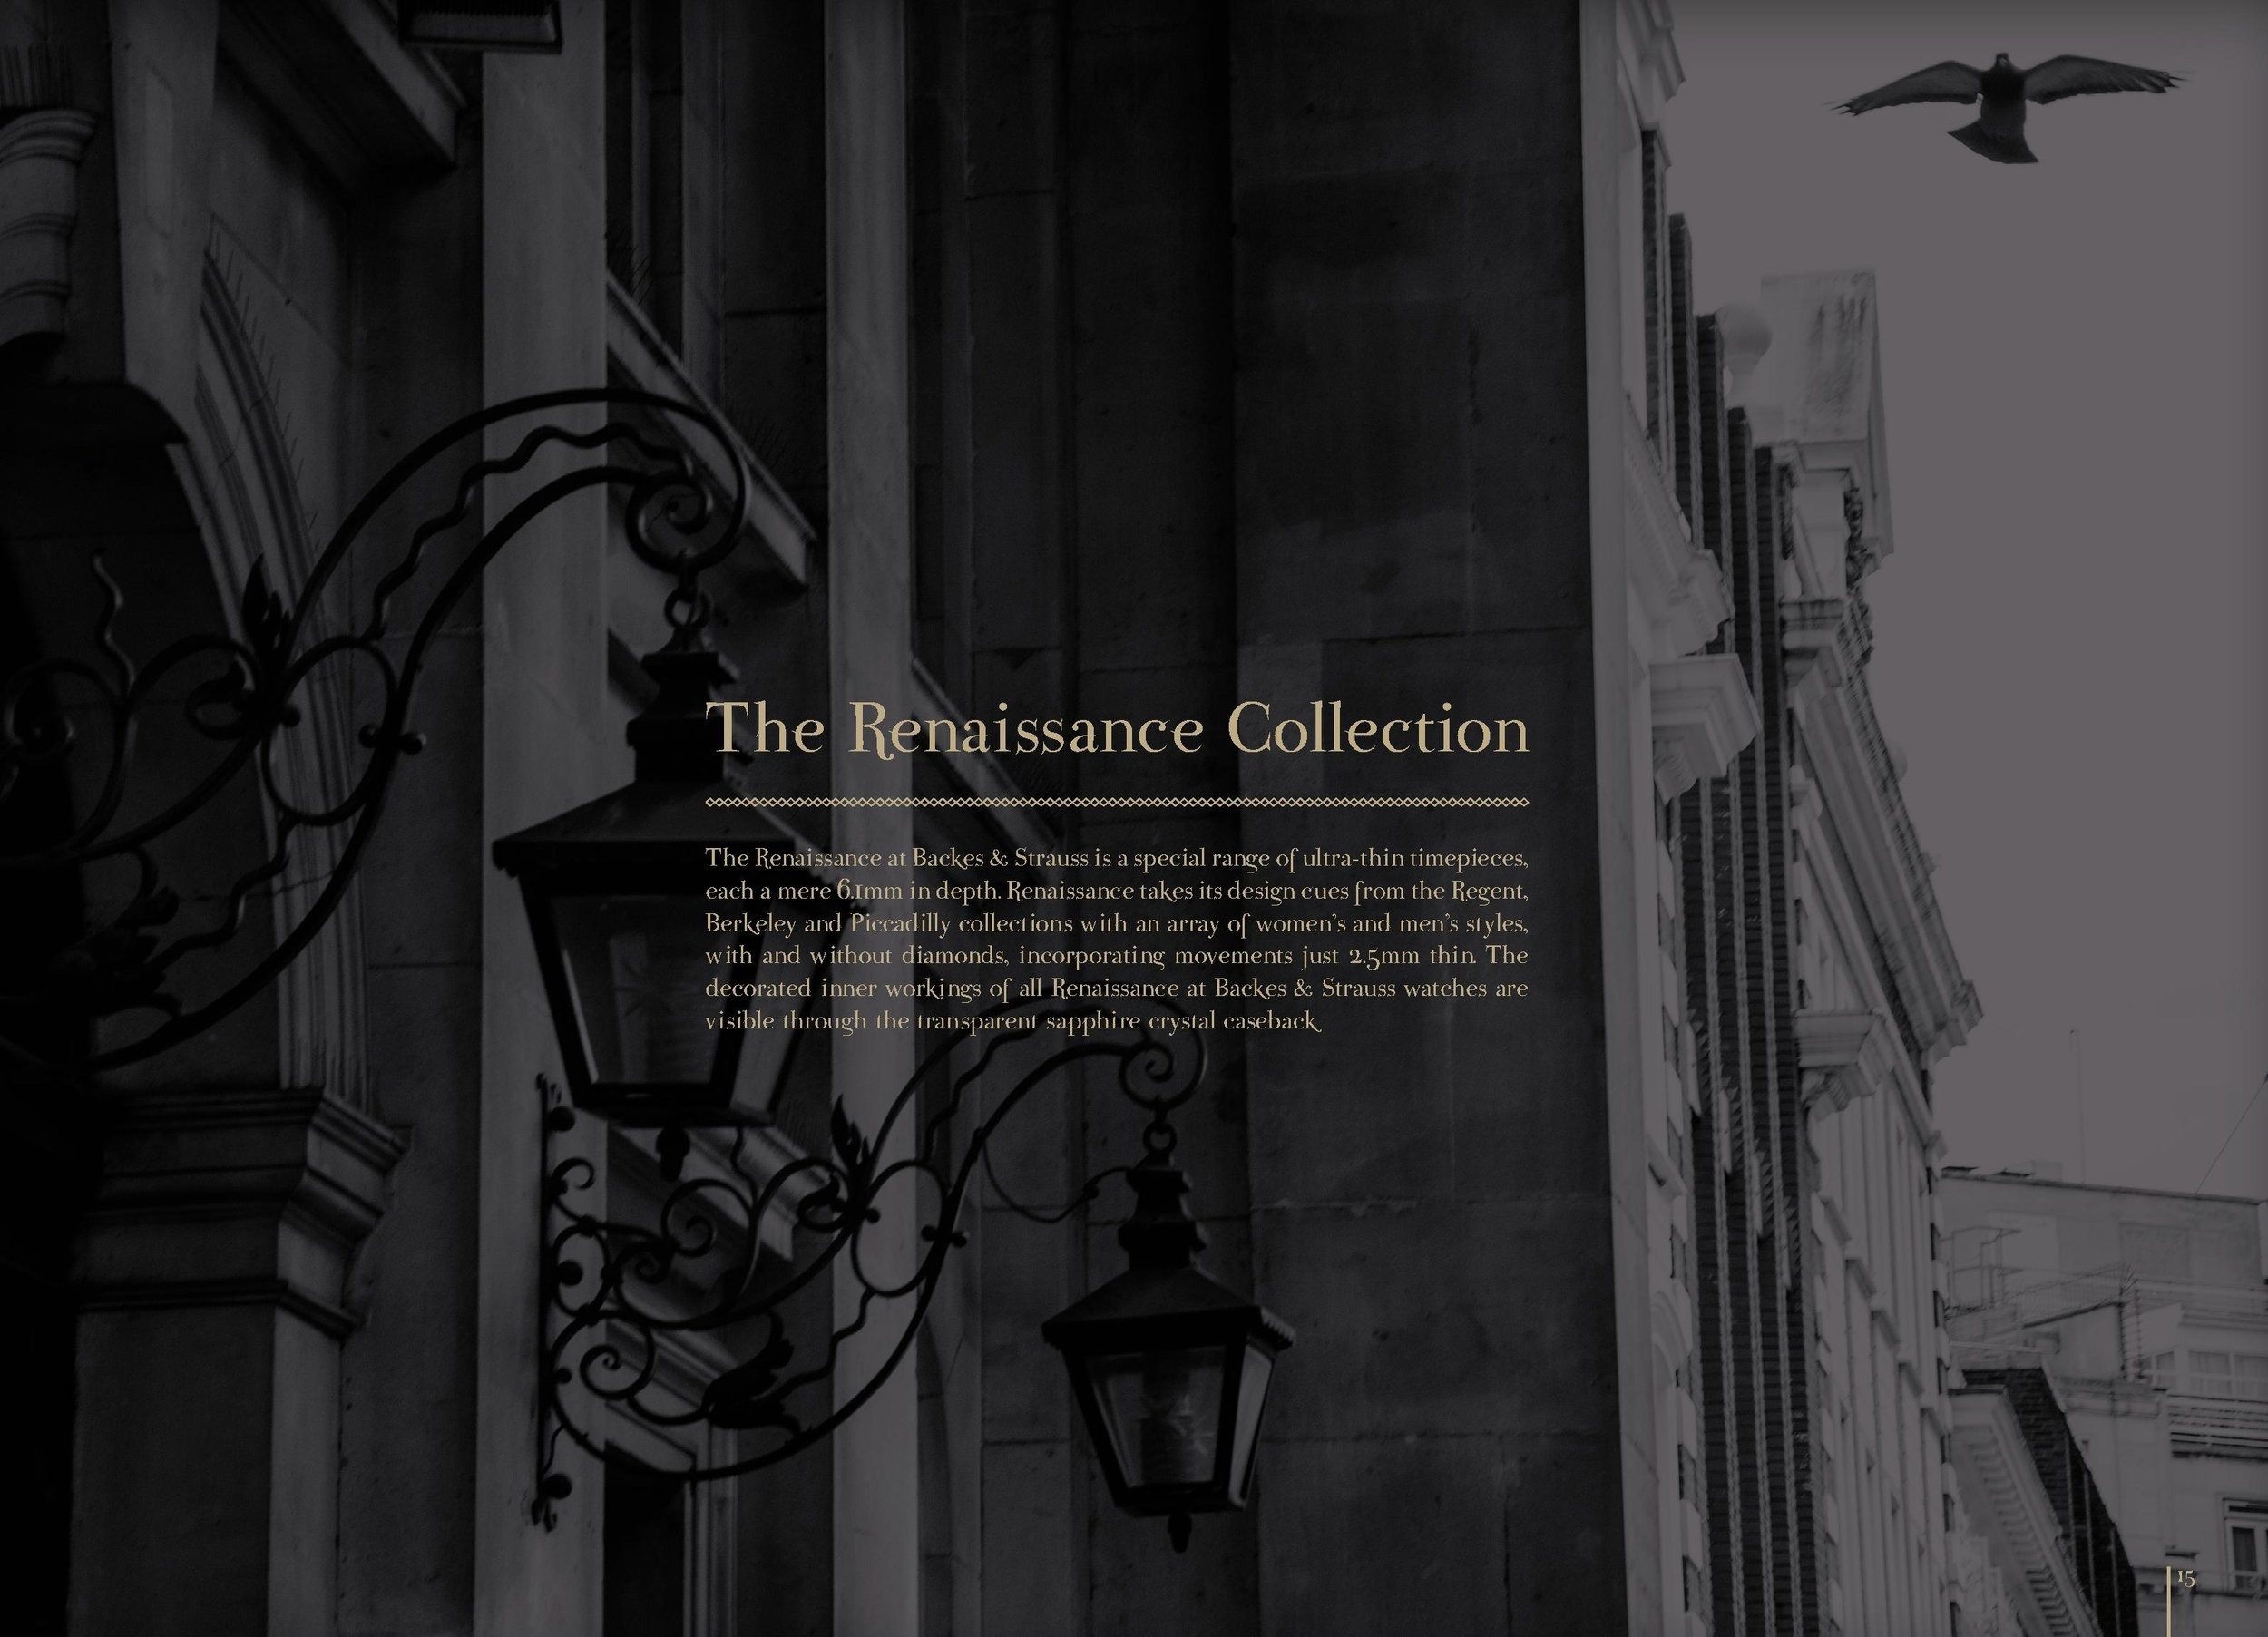 The Renaissance Collection